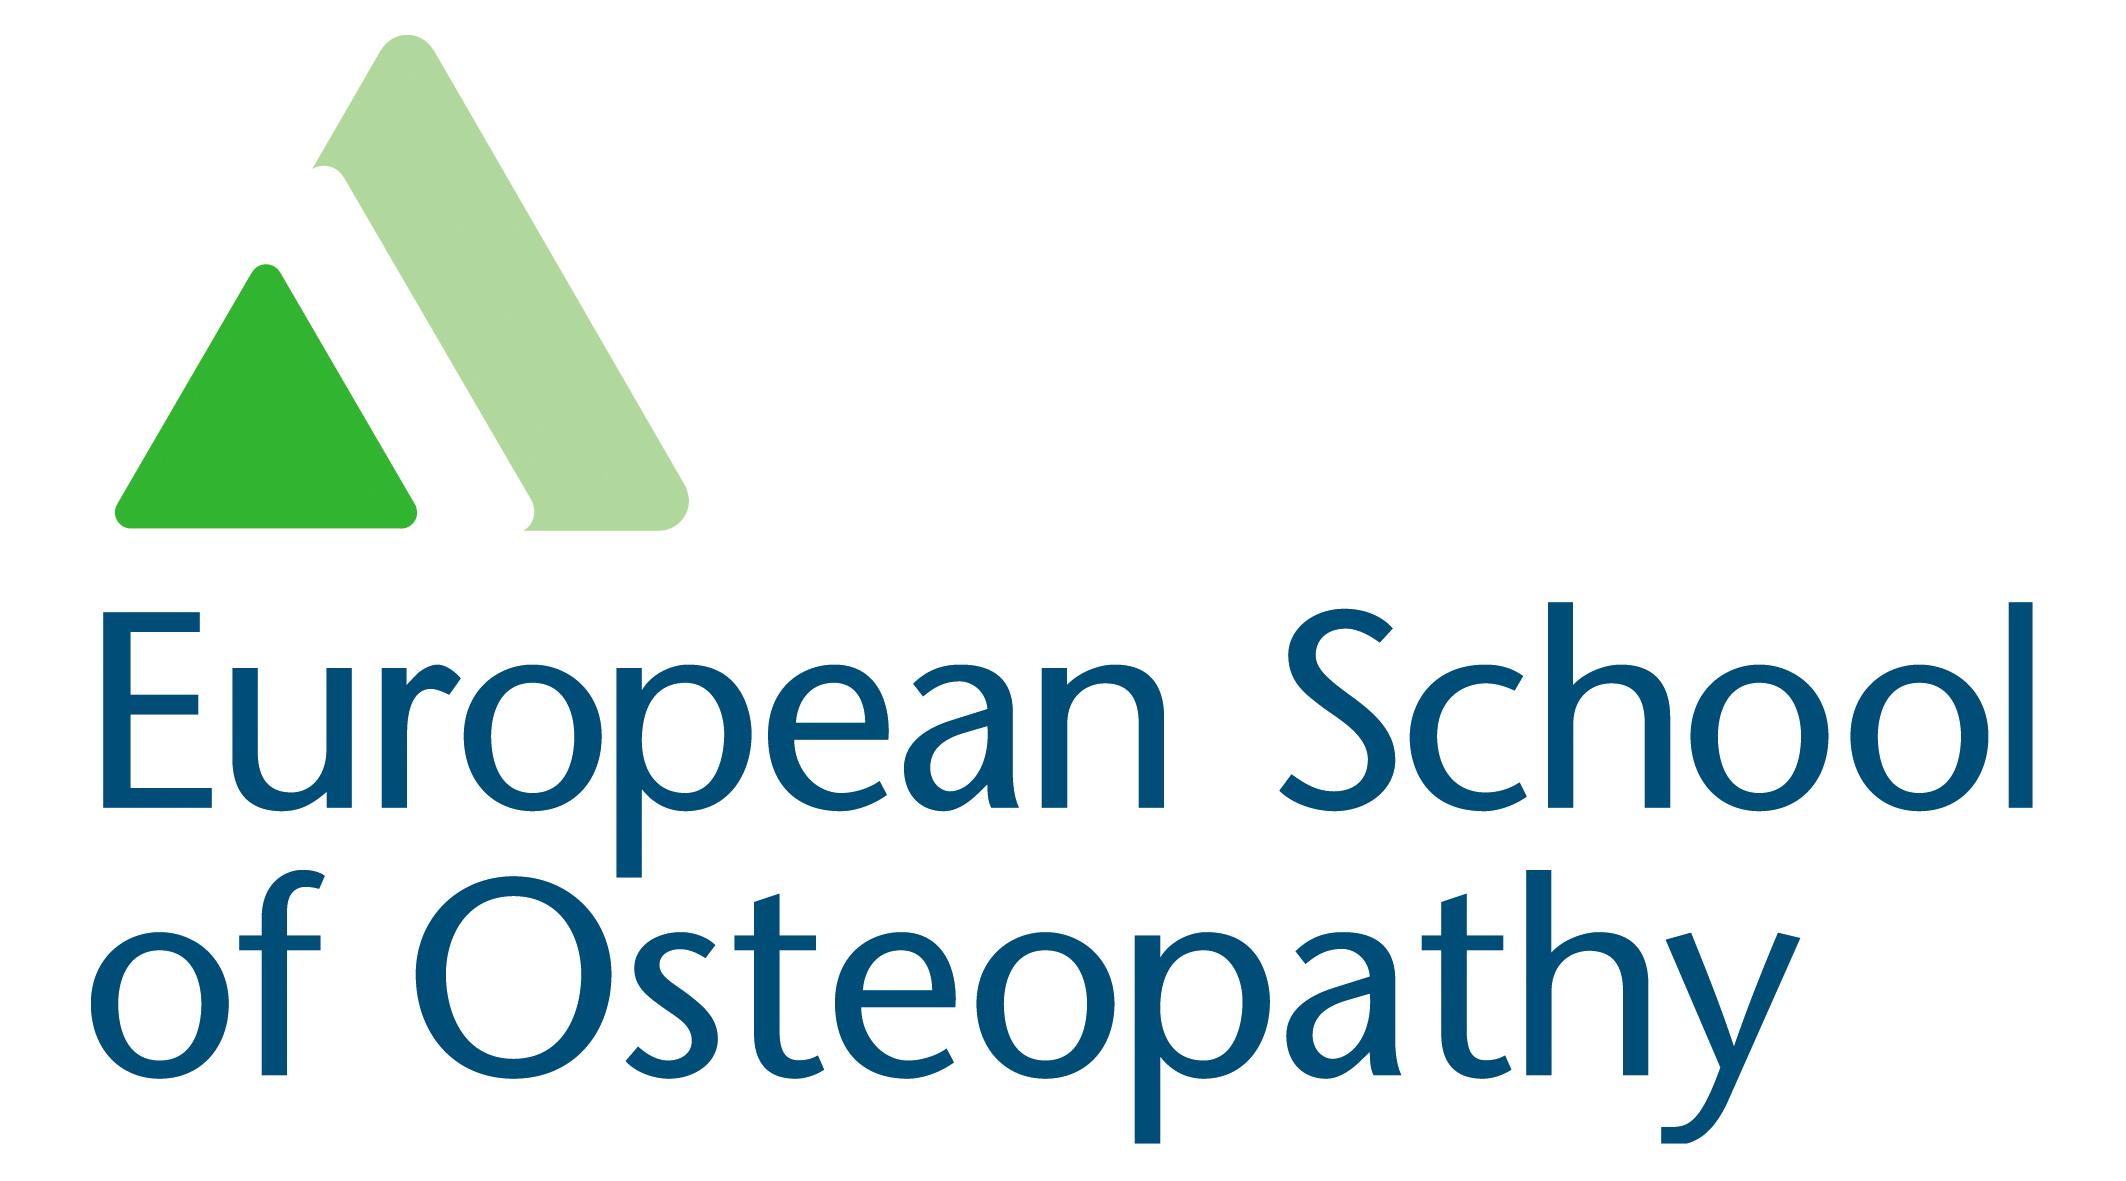 logo for European School of Osteopathy